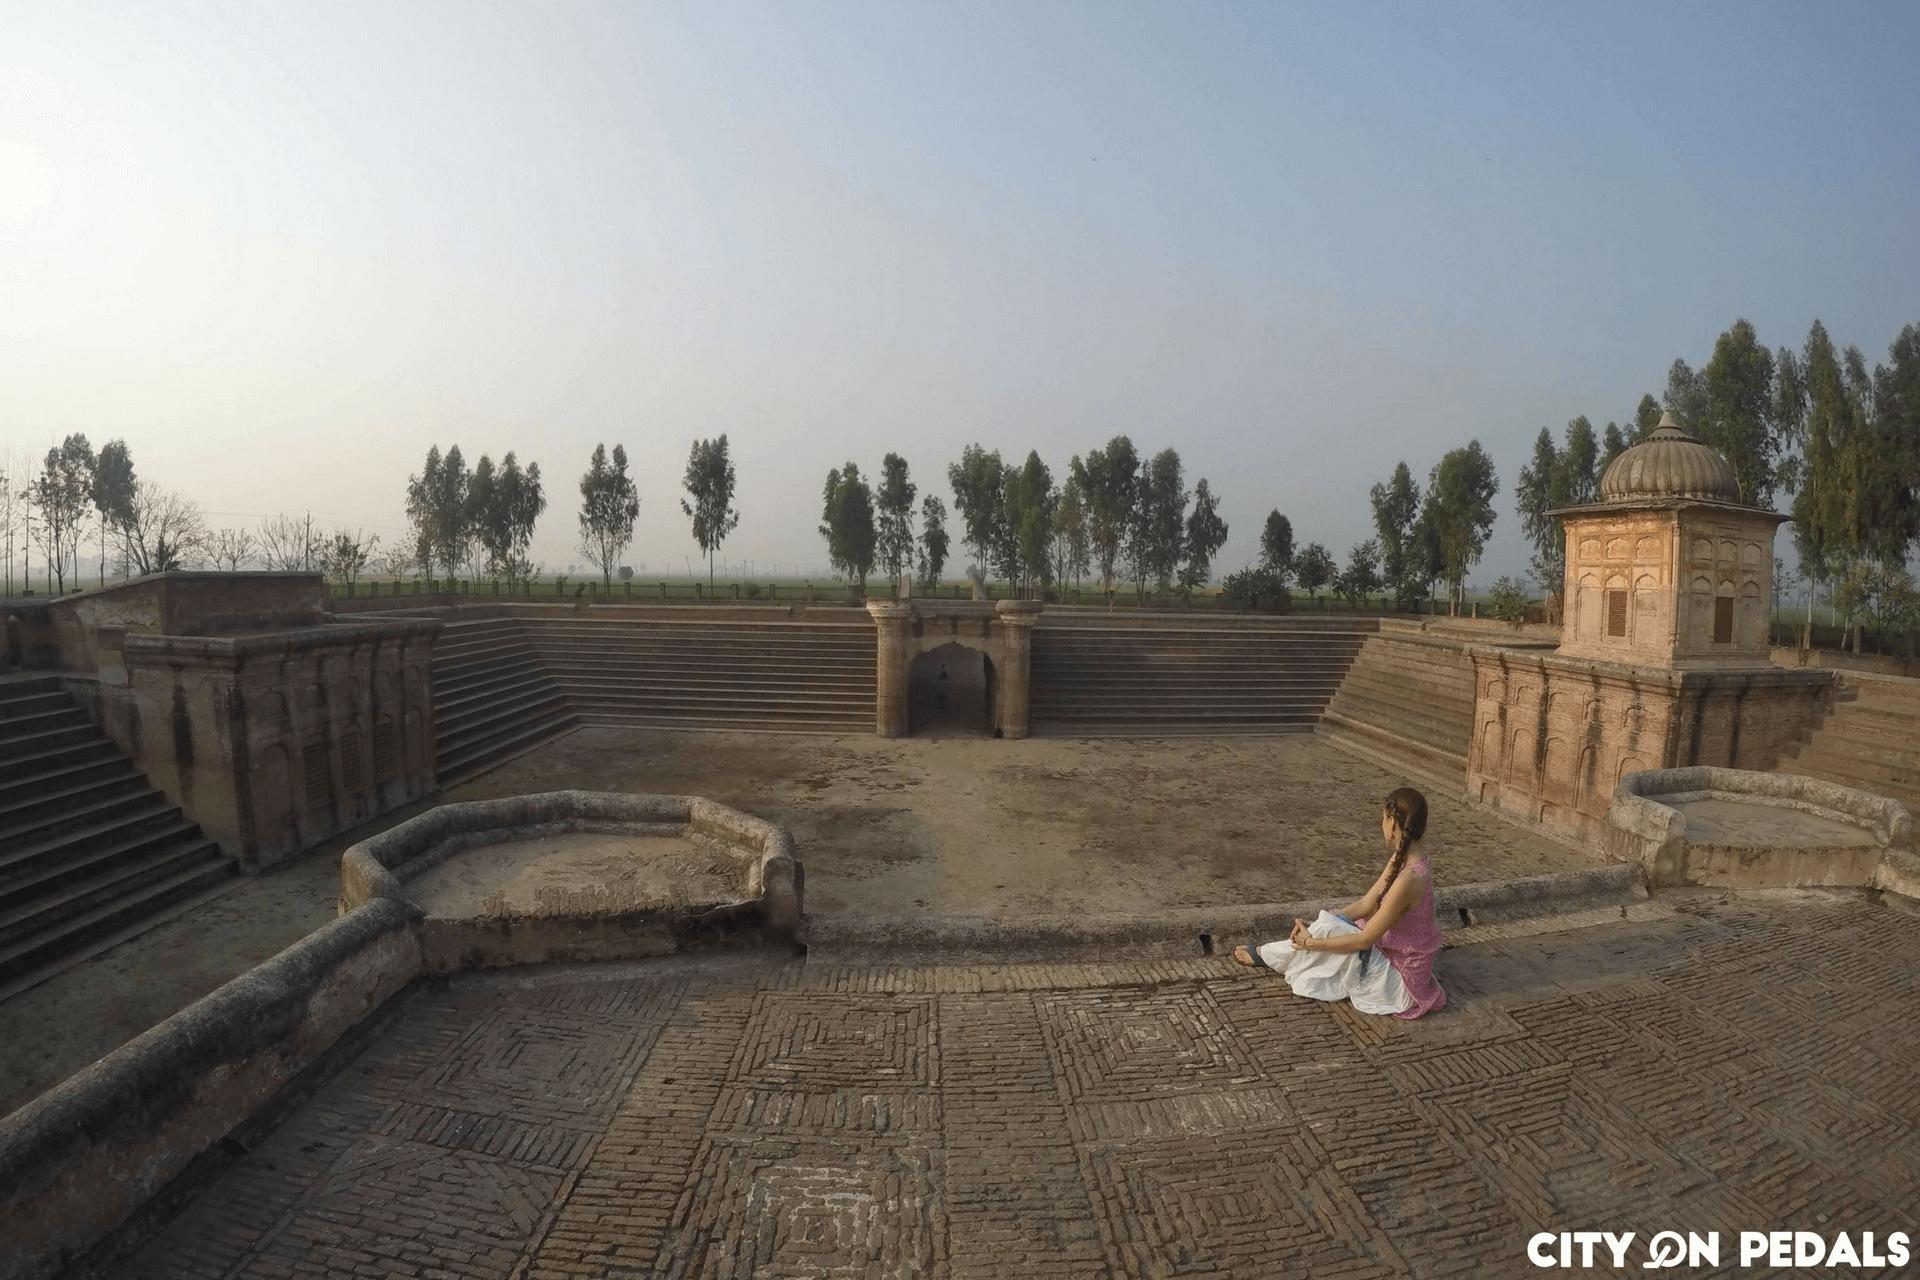 Pul Kanjari well